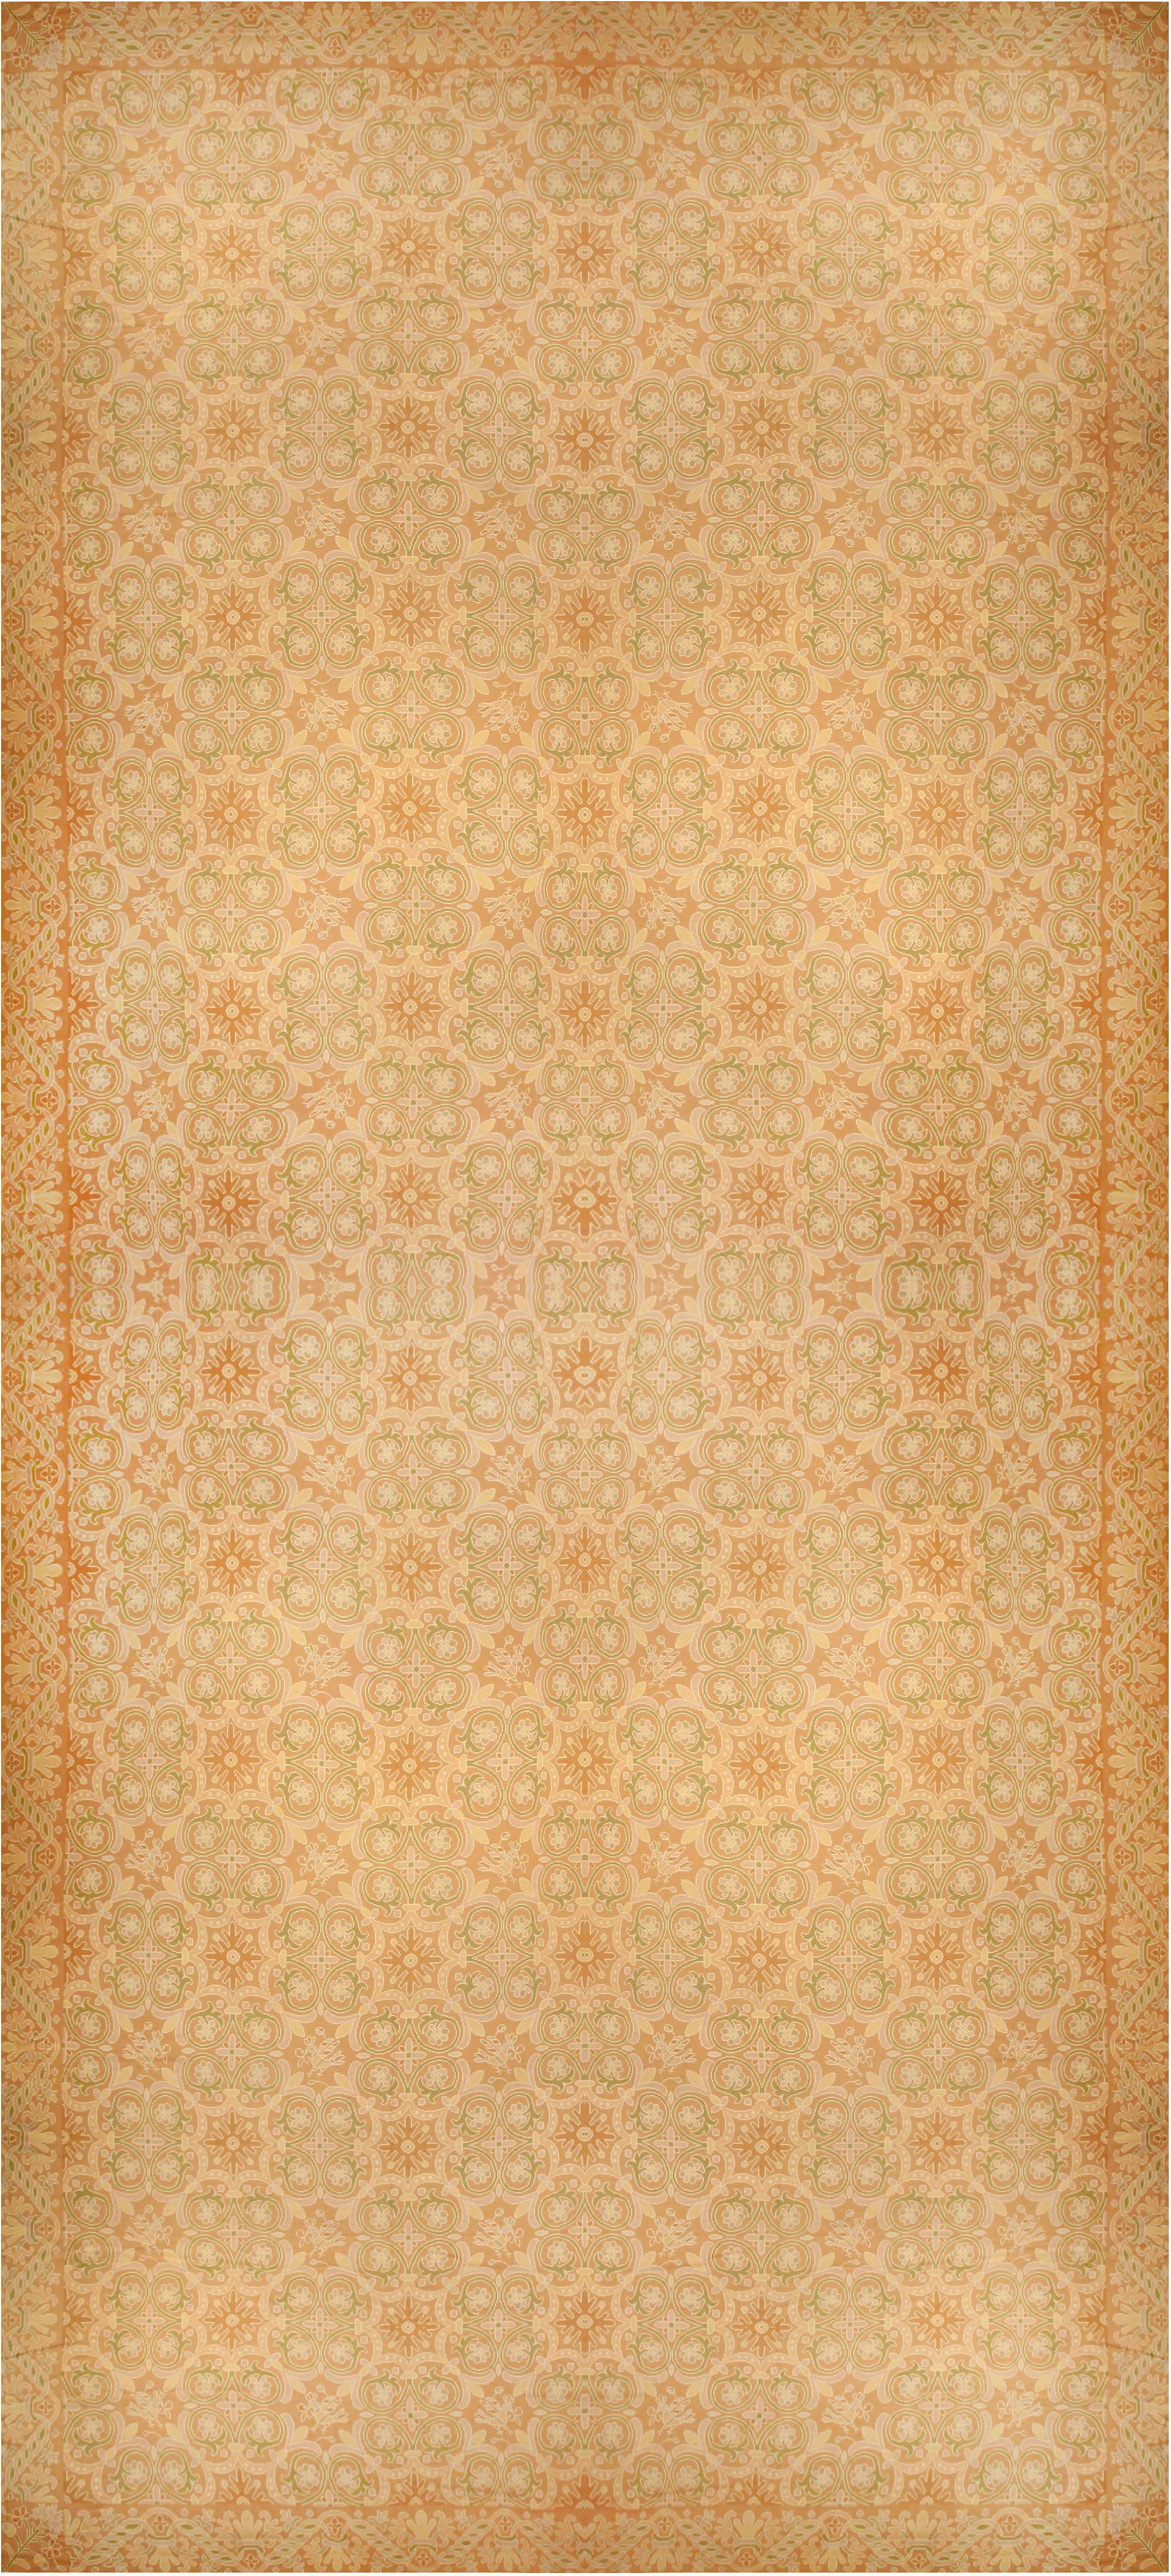 Extra Large Antique Portuguese Needlework Carpet BB3916